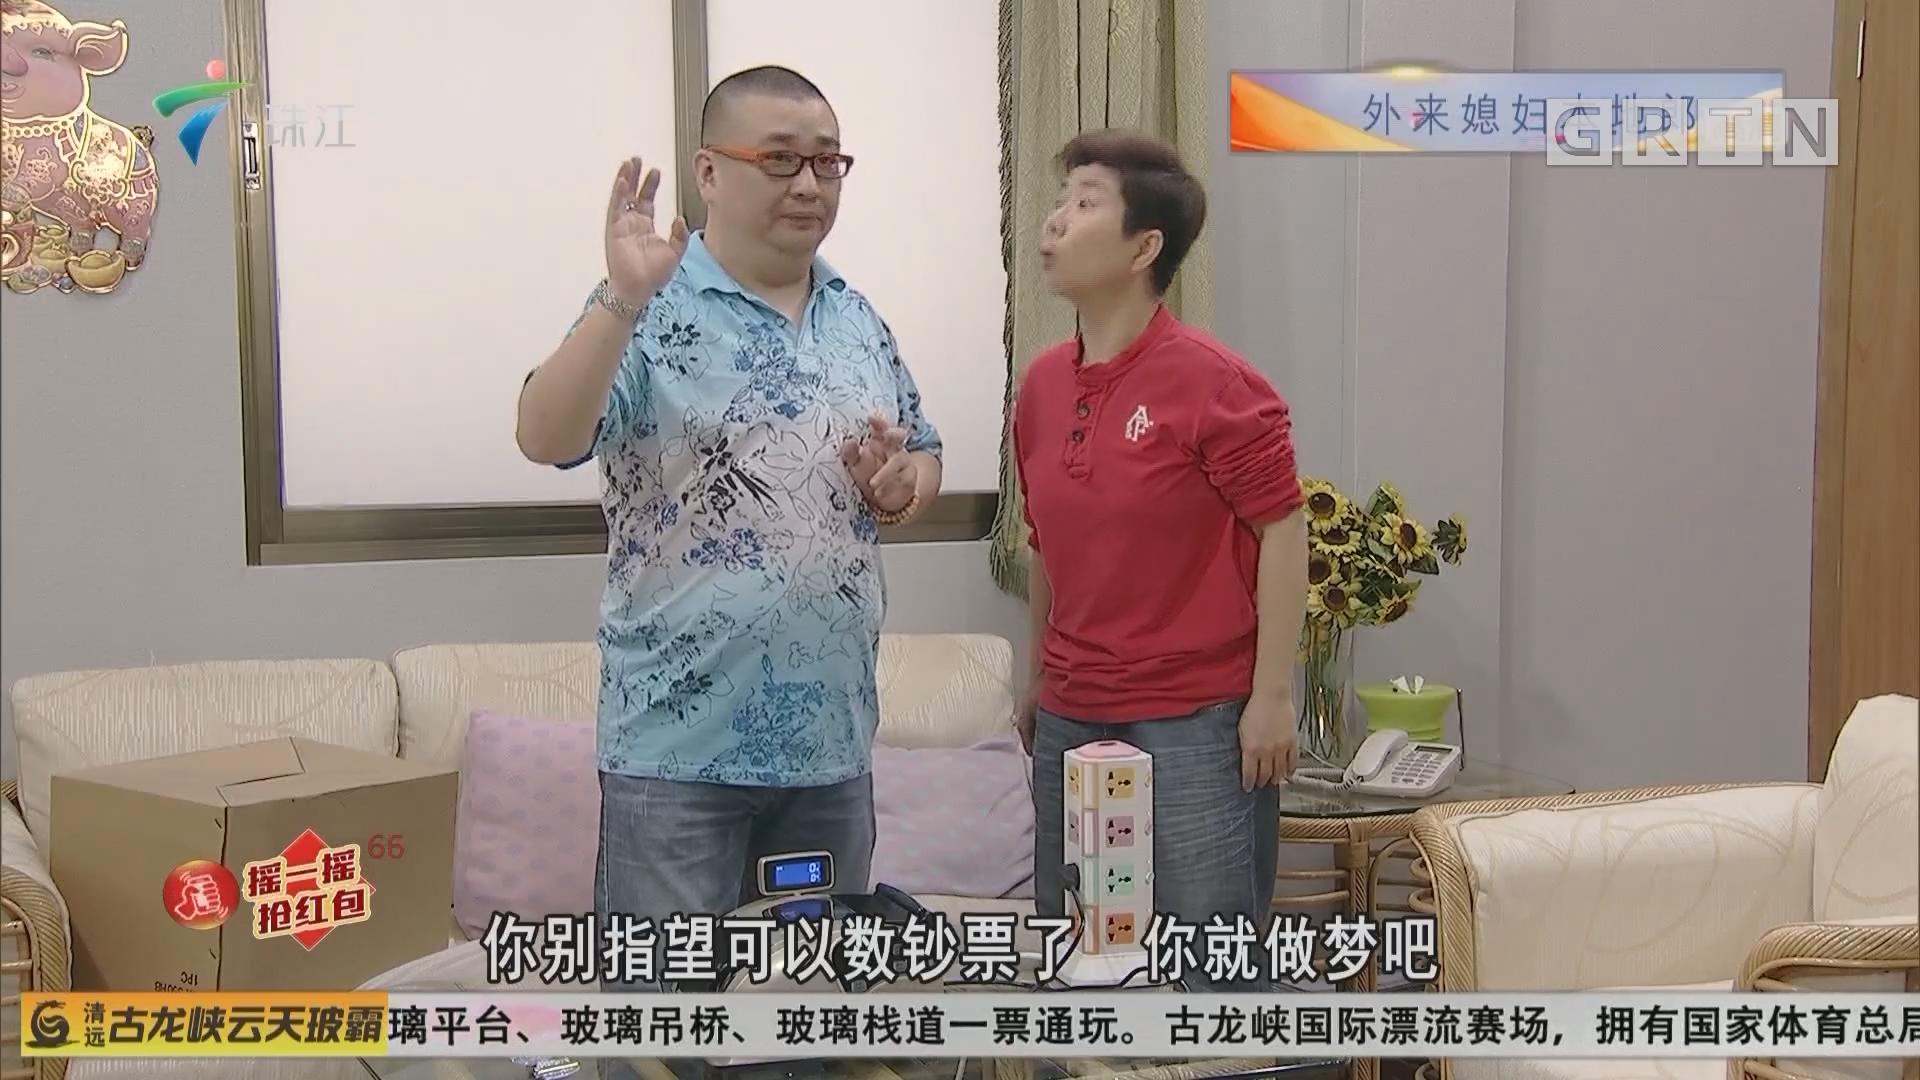 [HD][2019-05-11]外来媳妇本地郎:人蠢有药医(上)